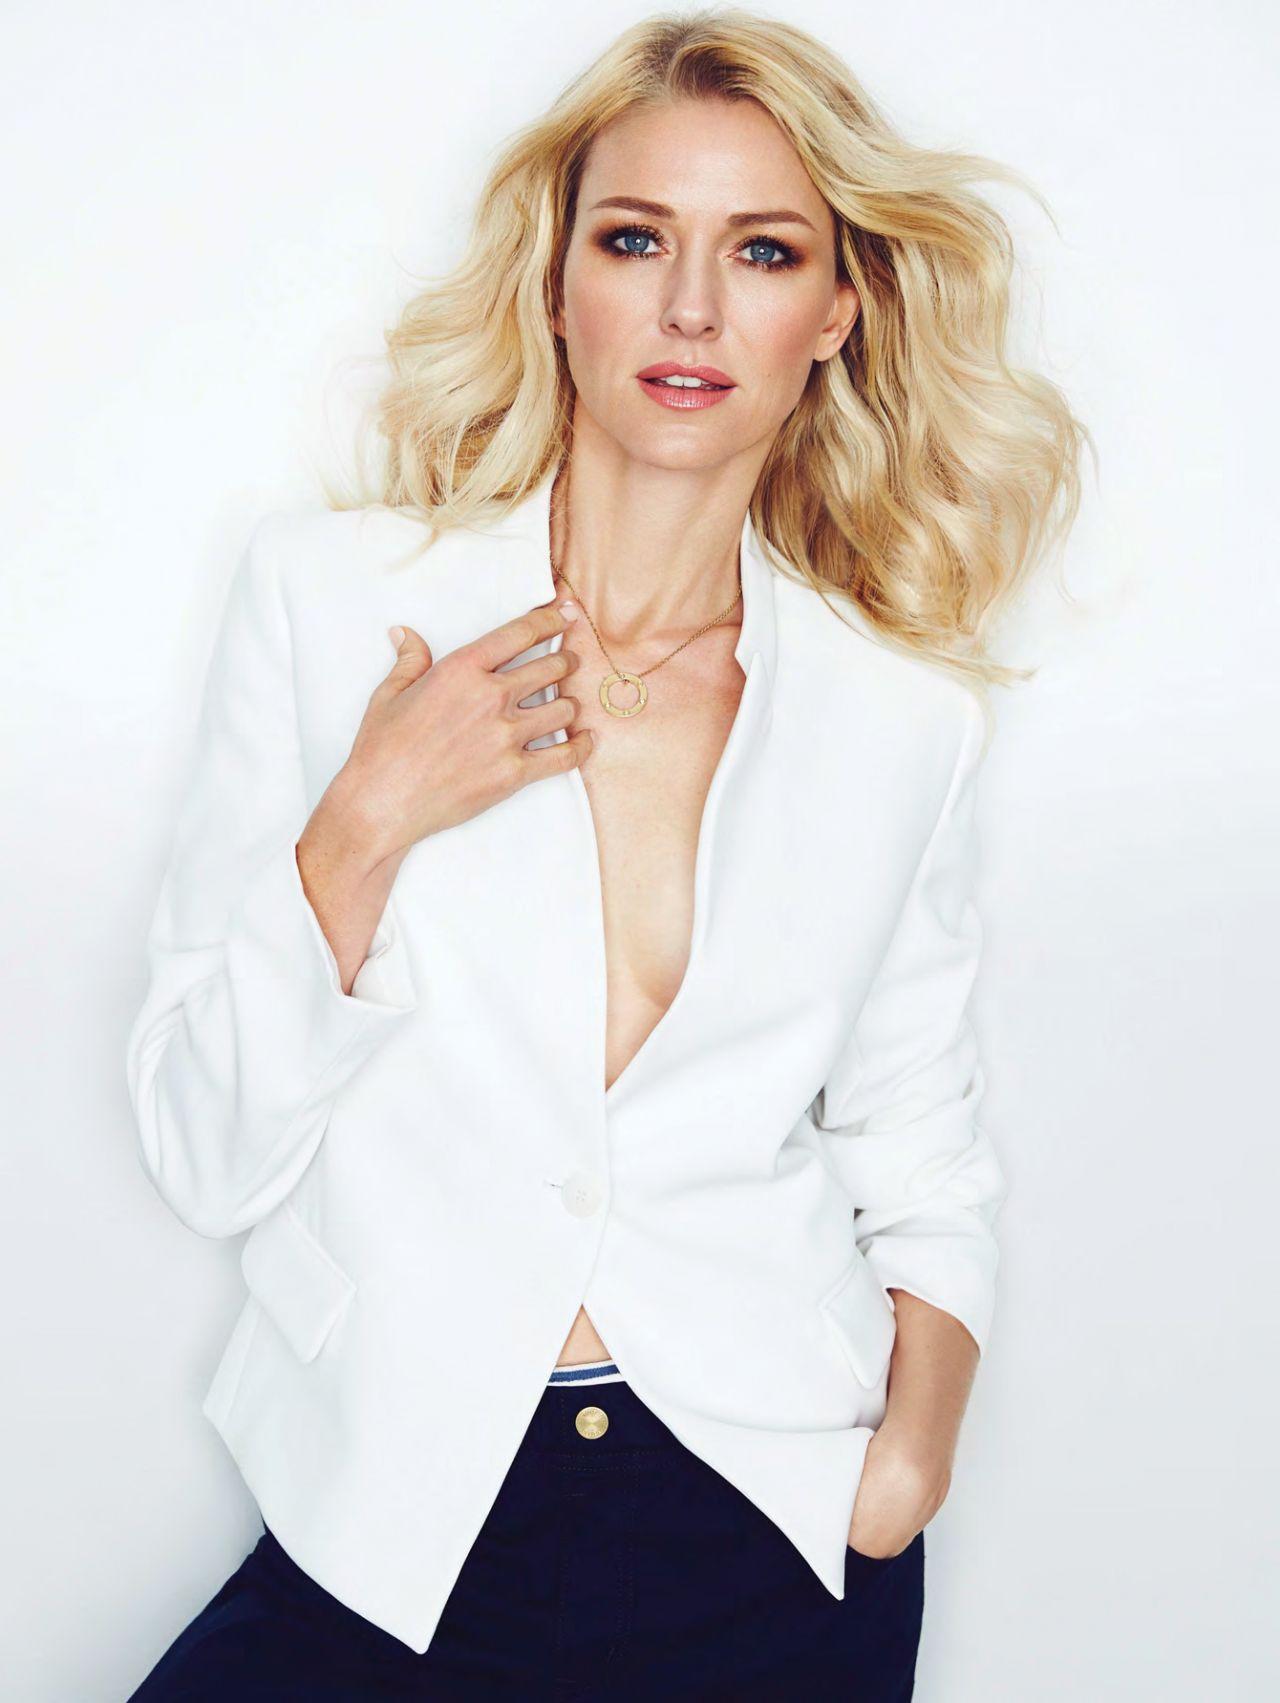 Naomi Watts – Photoshoot for InStyle Magazine (UK) February 2015 Naomi Watts